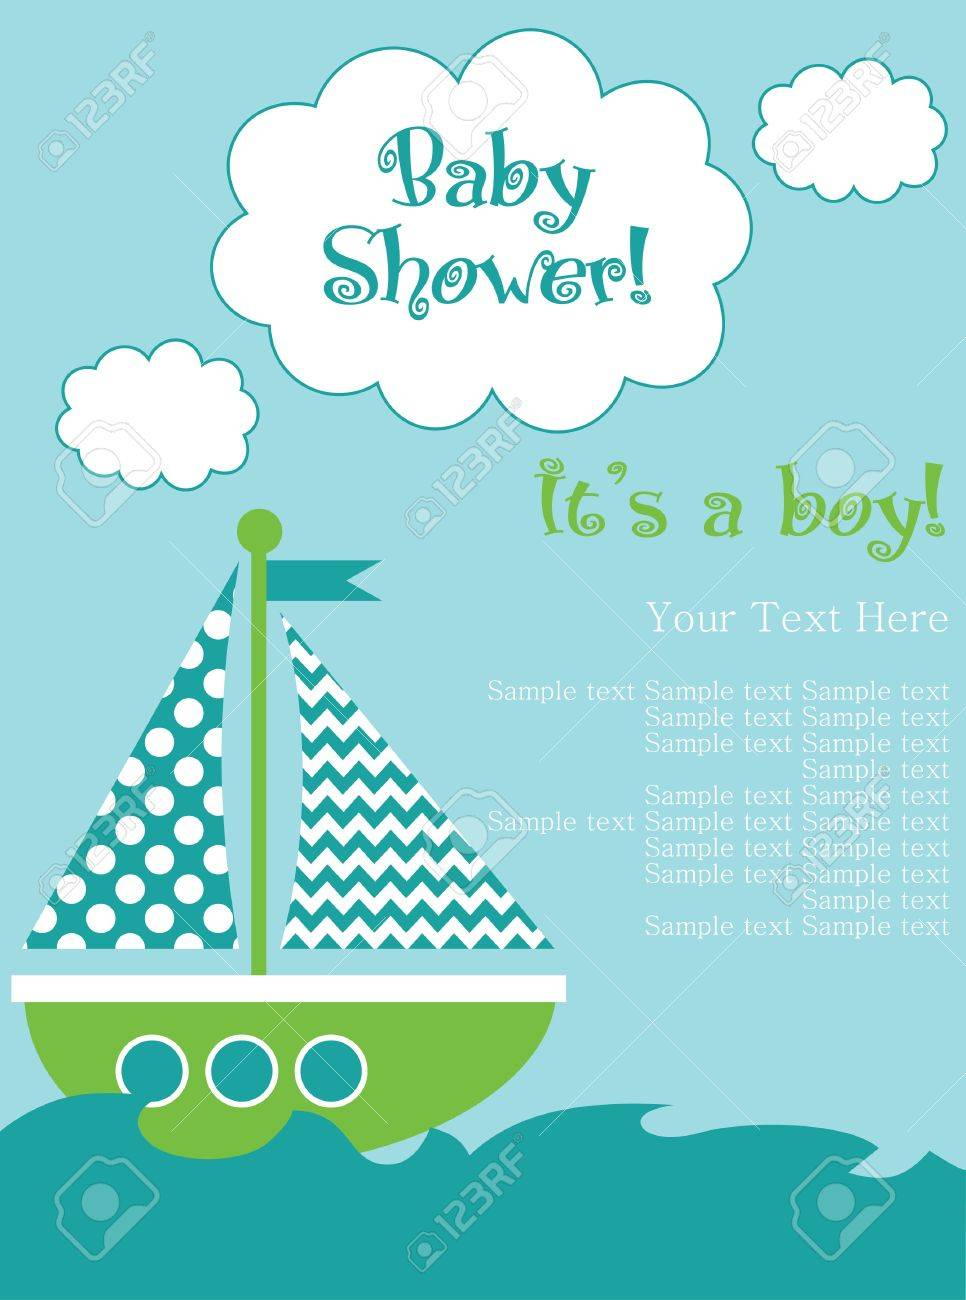 baby shower card design. vector illustration Stock Vector - 20561720